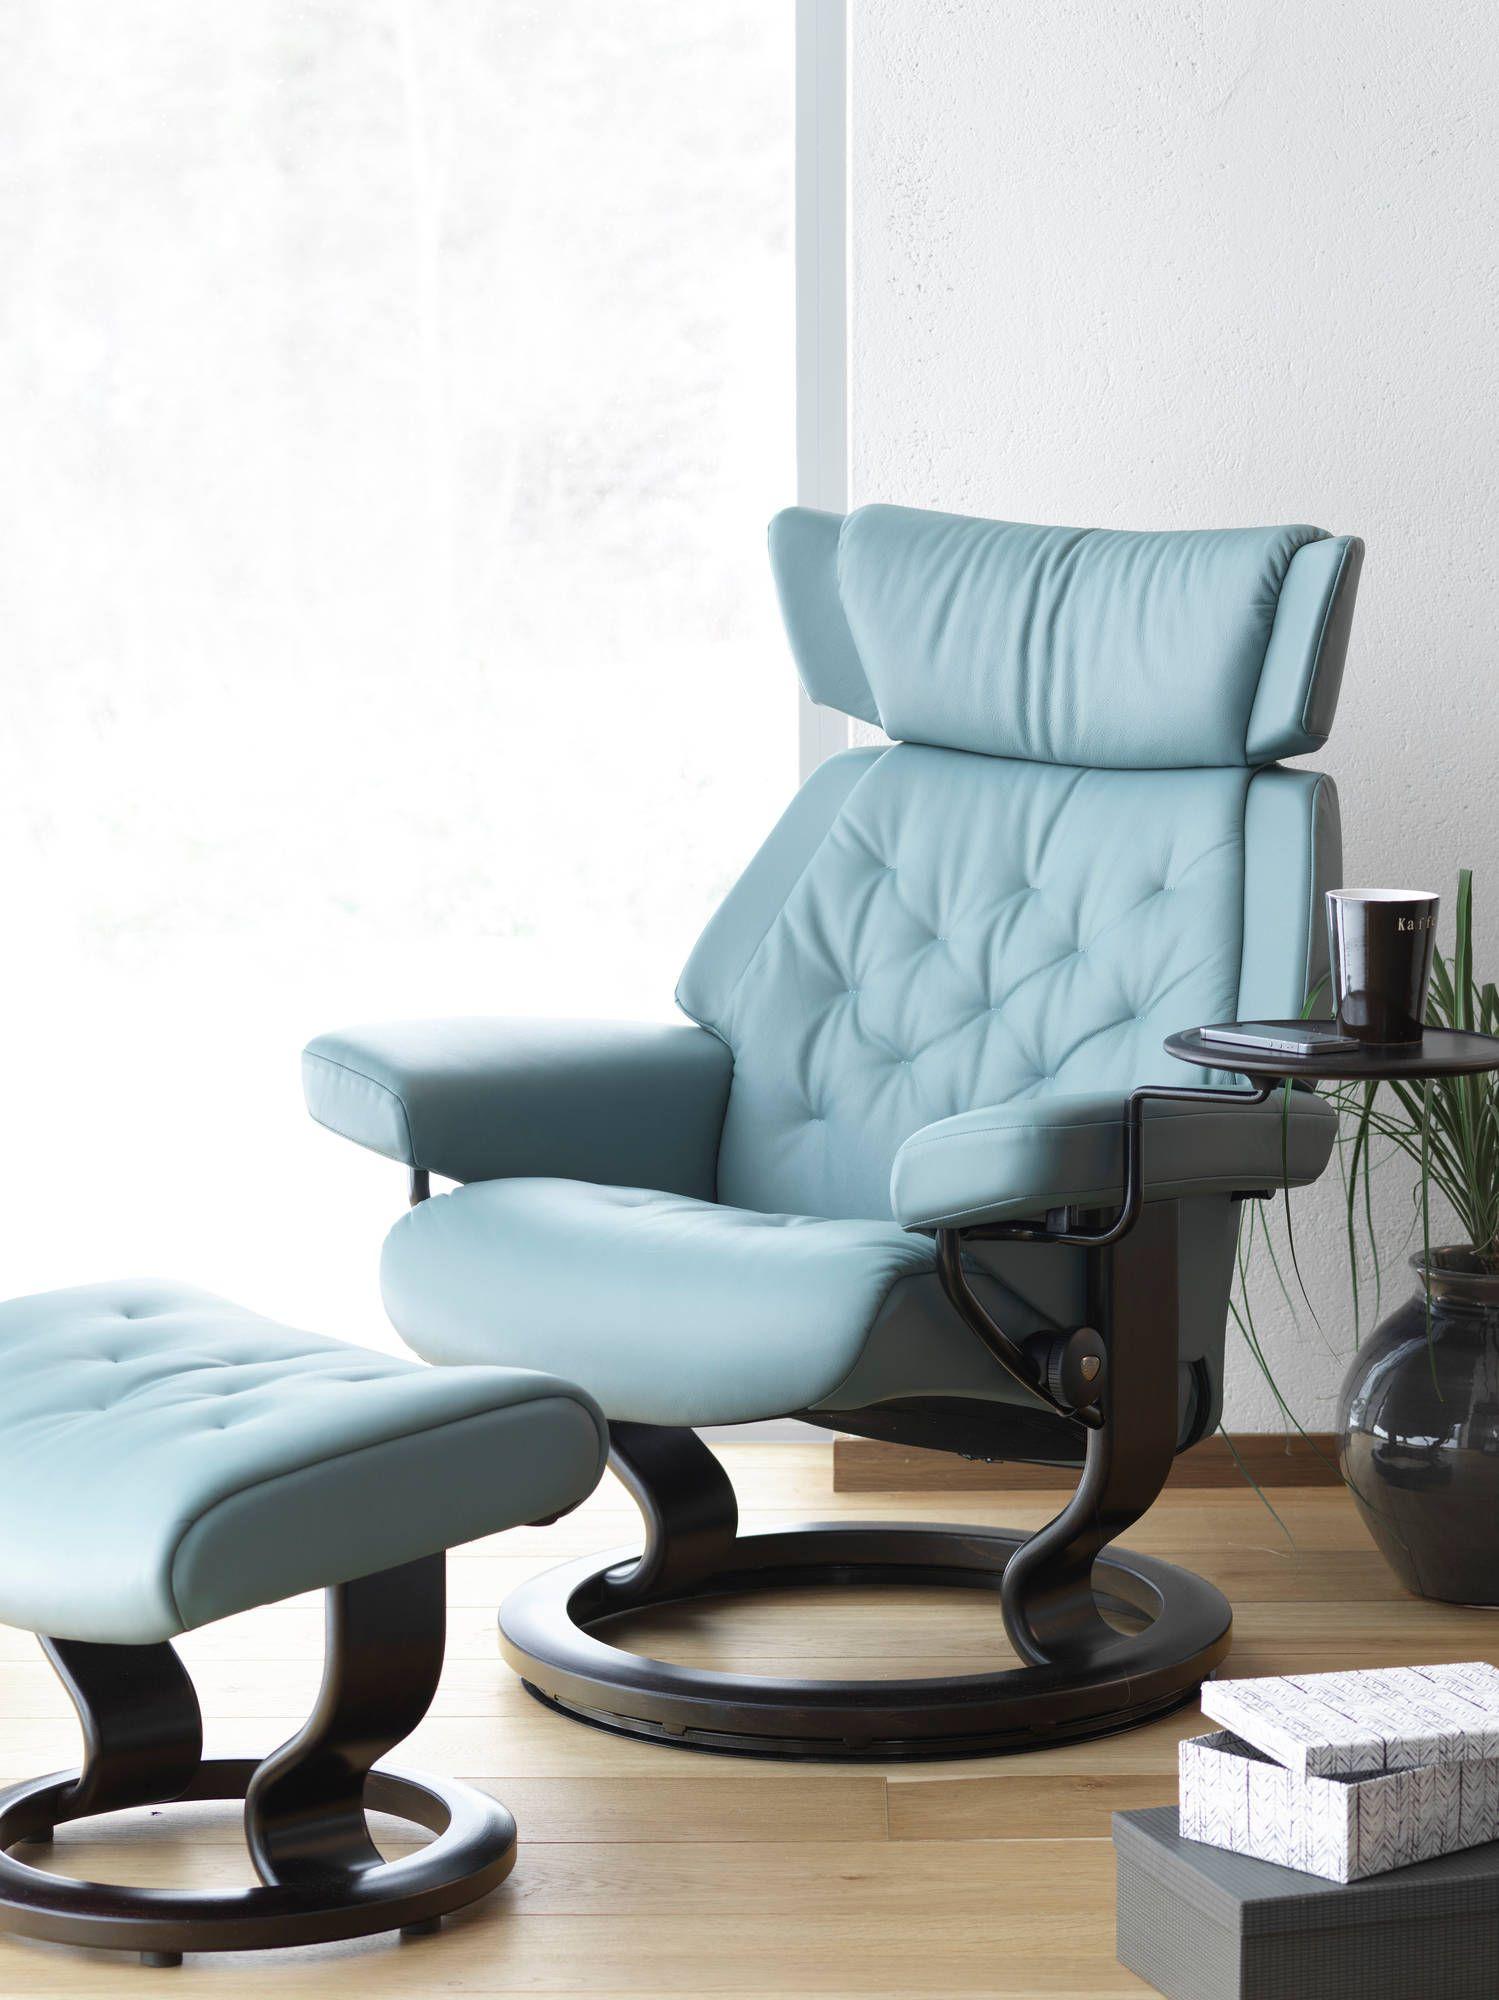 Stressless Chair Similar Velvet Club Skyline Recliner In Paloma Leather Color Aqua